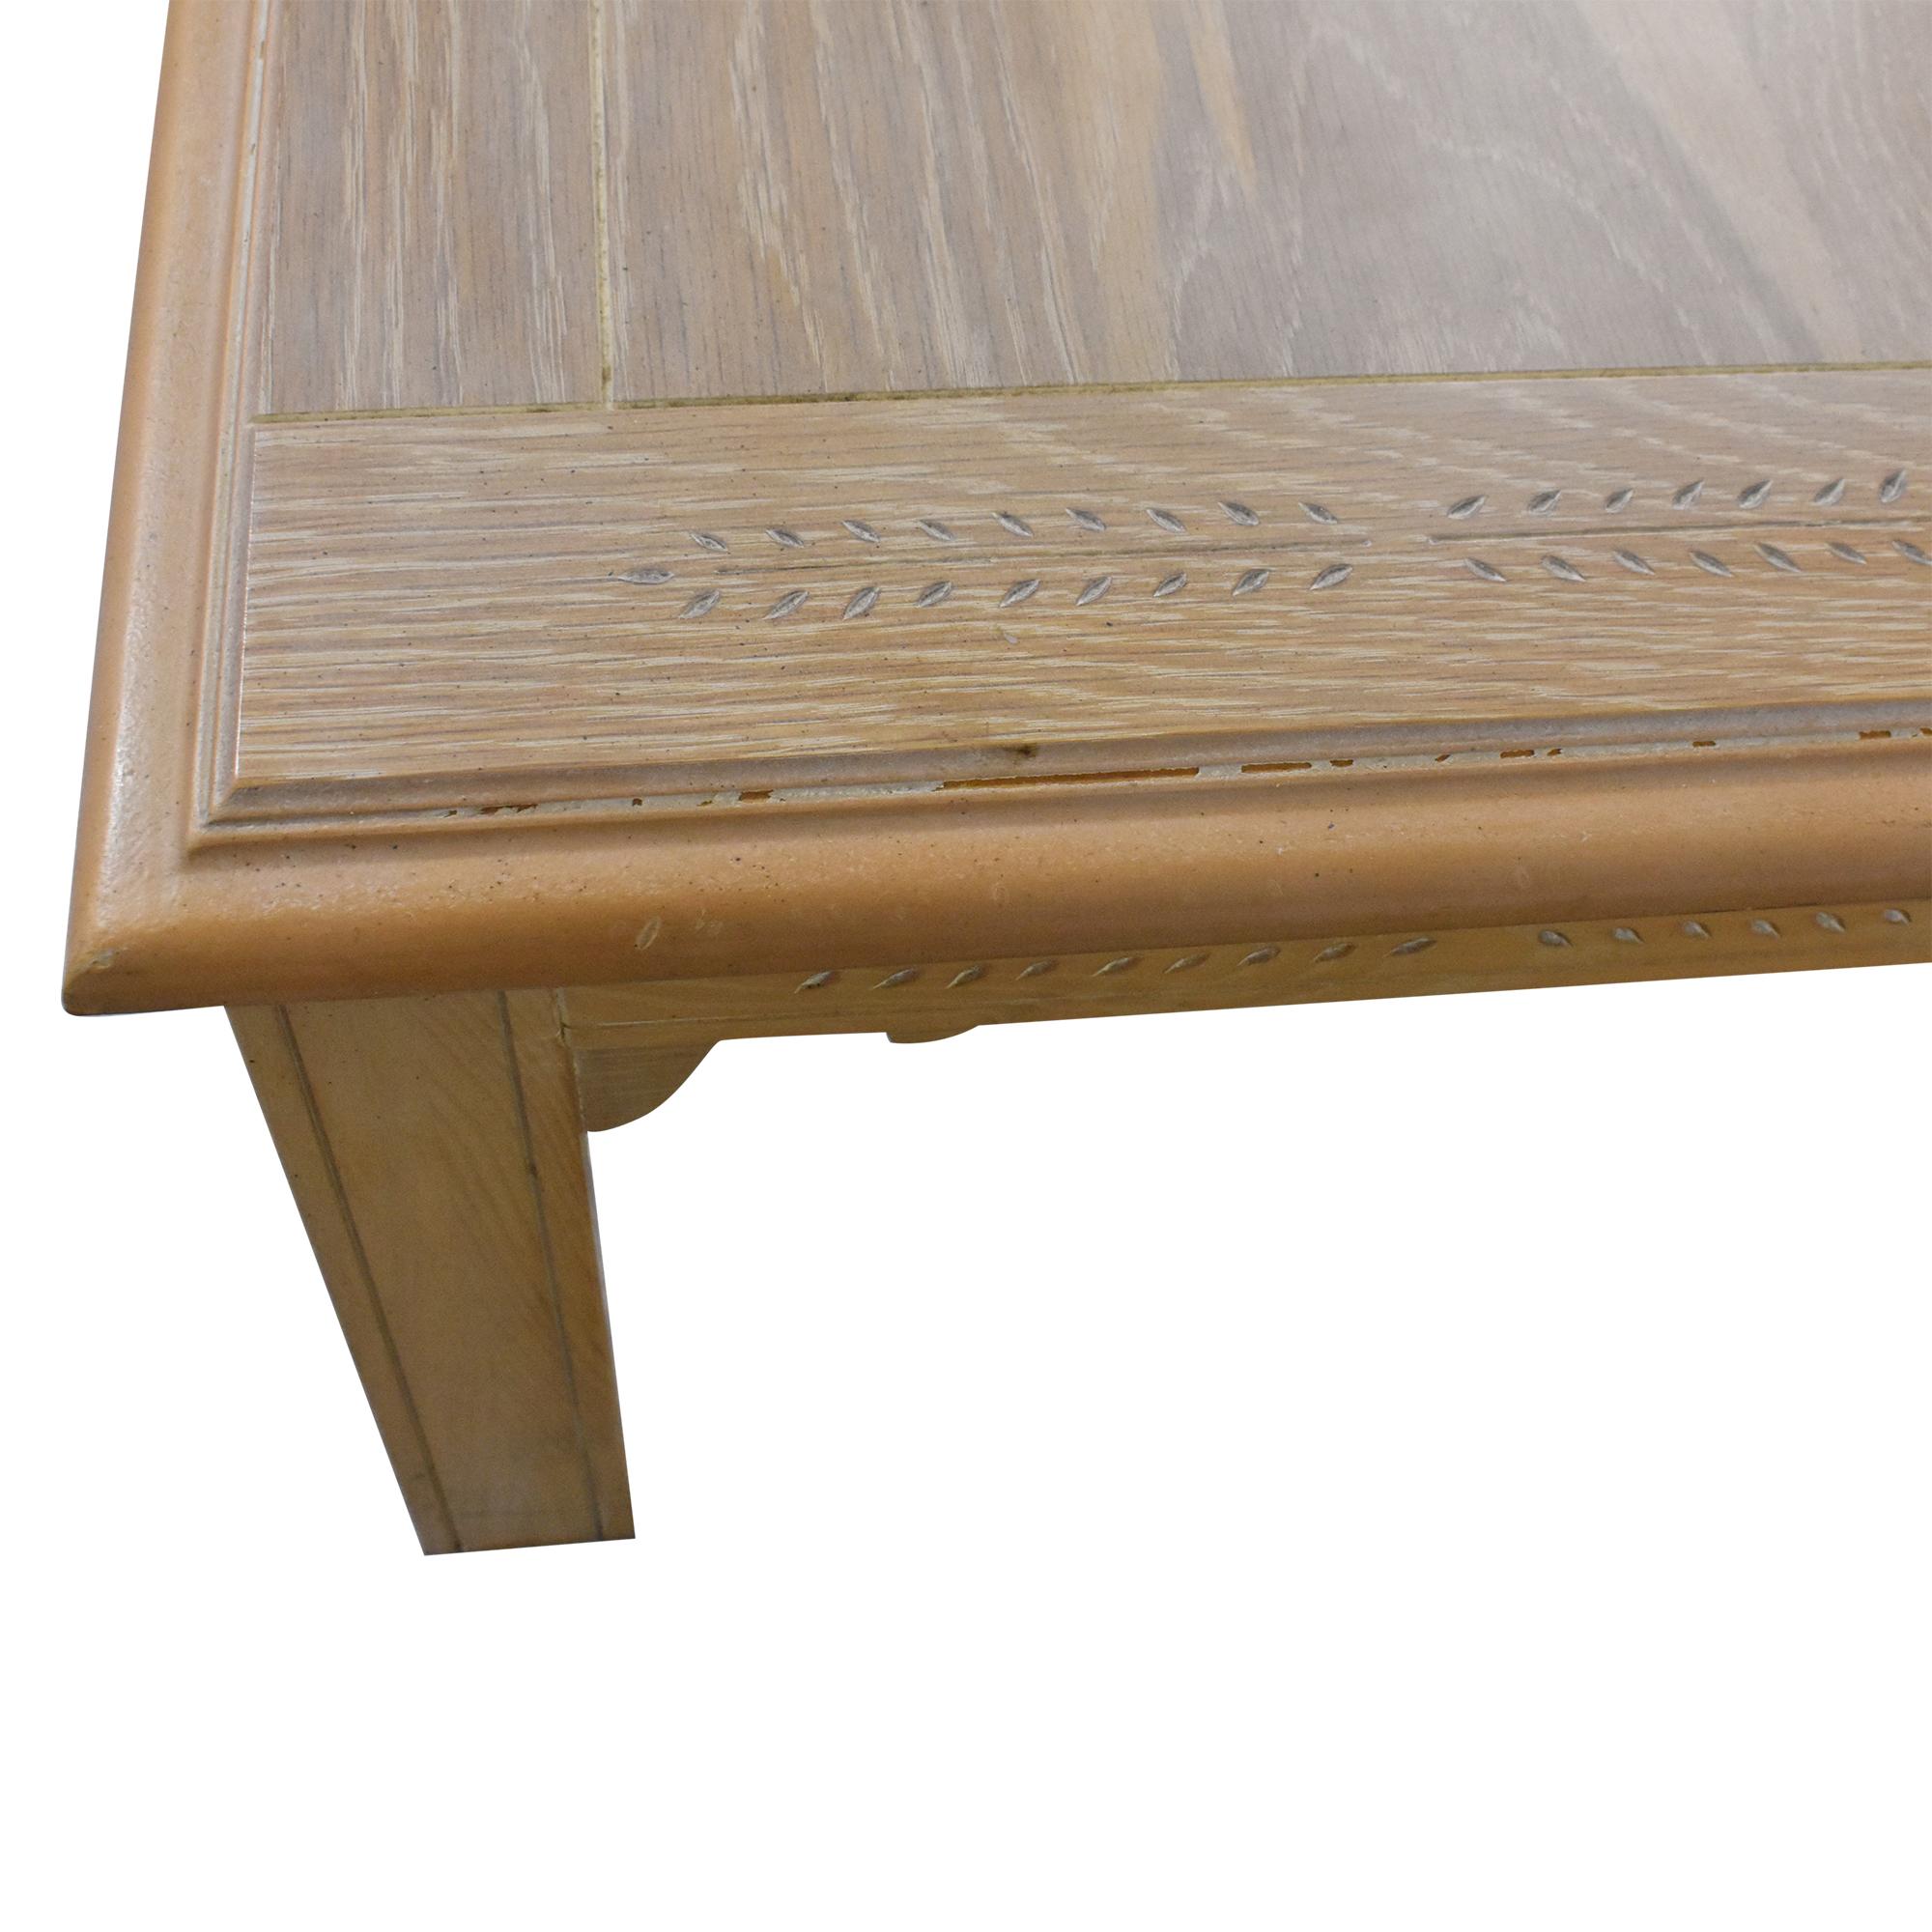 Lane Furniture Lane Furniture Virginia Maid Coffee Table discount